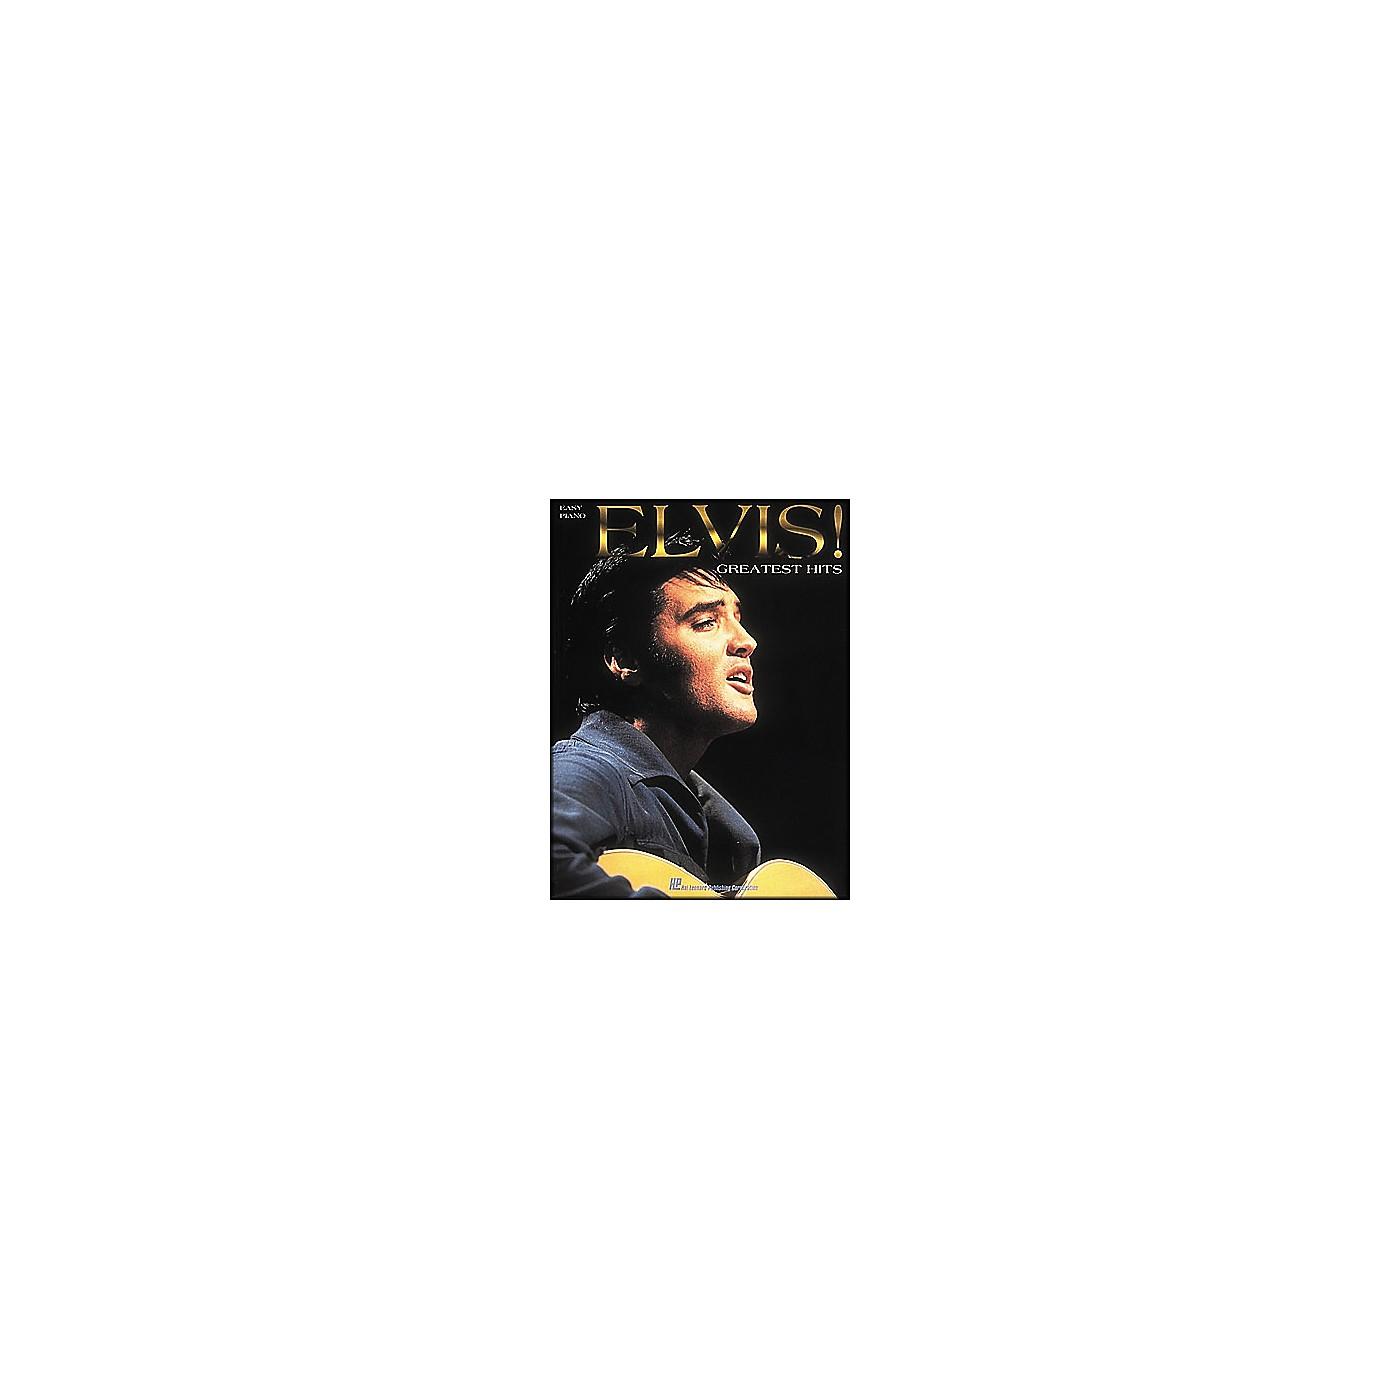 Hal Leonard Elvis! Greatest Hits for Easy Piano thumbnail